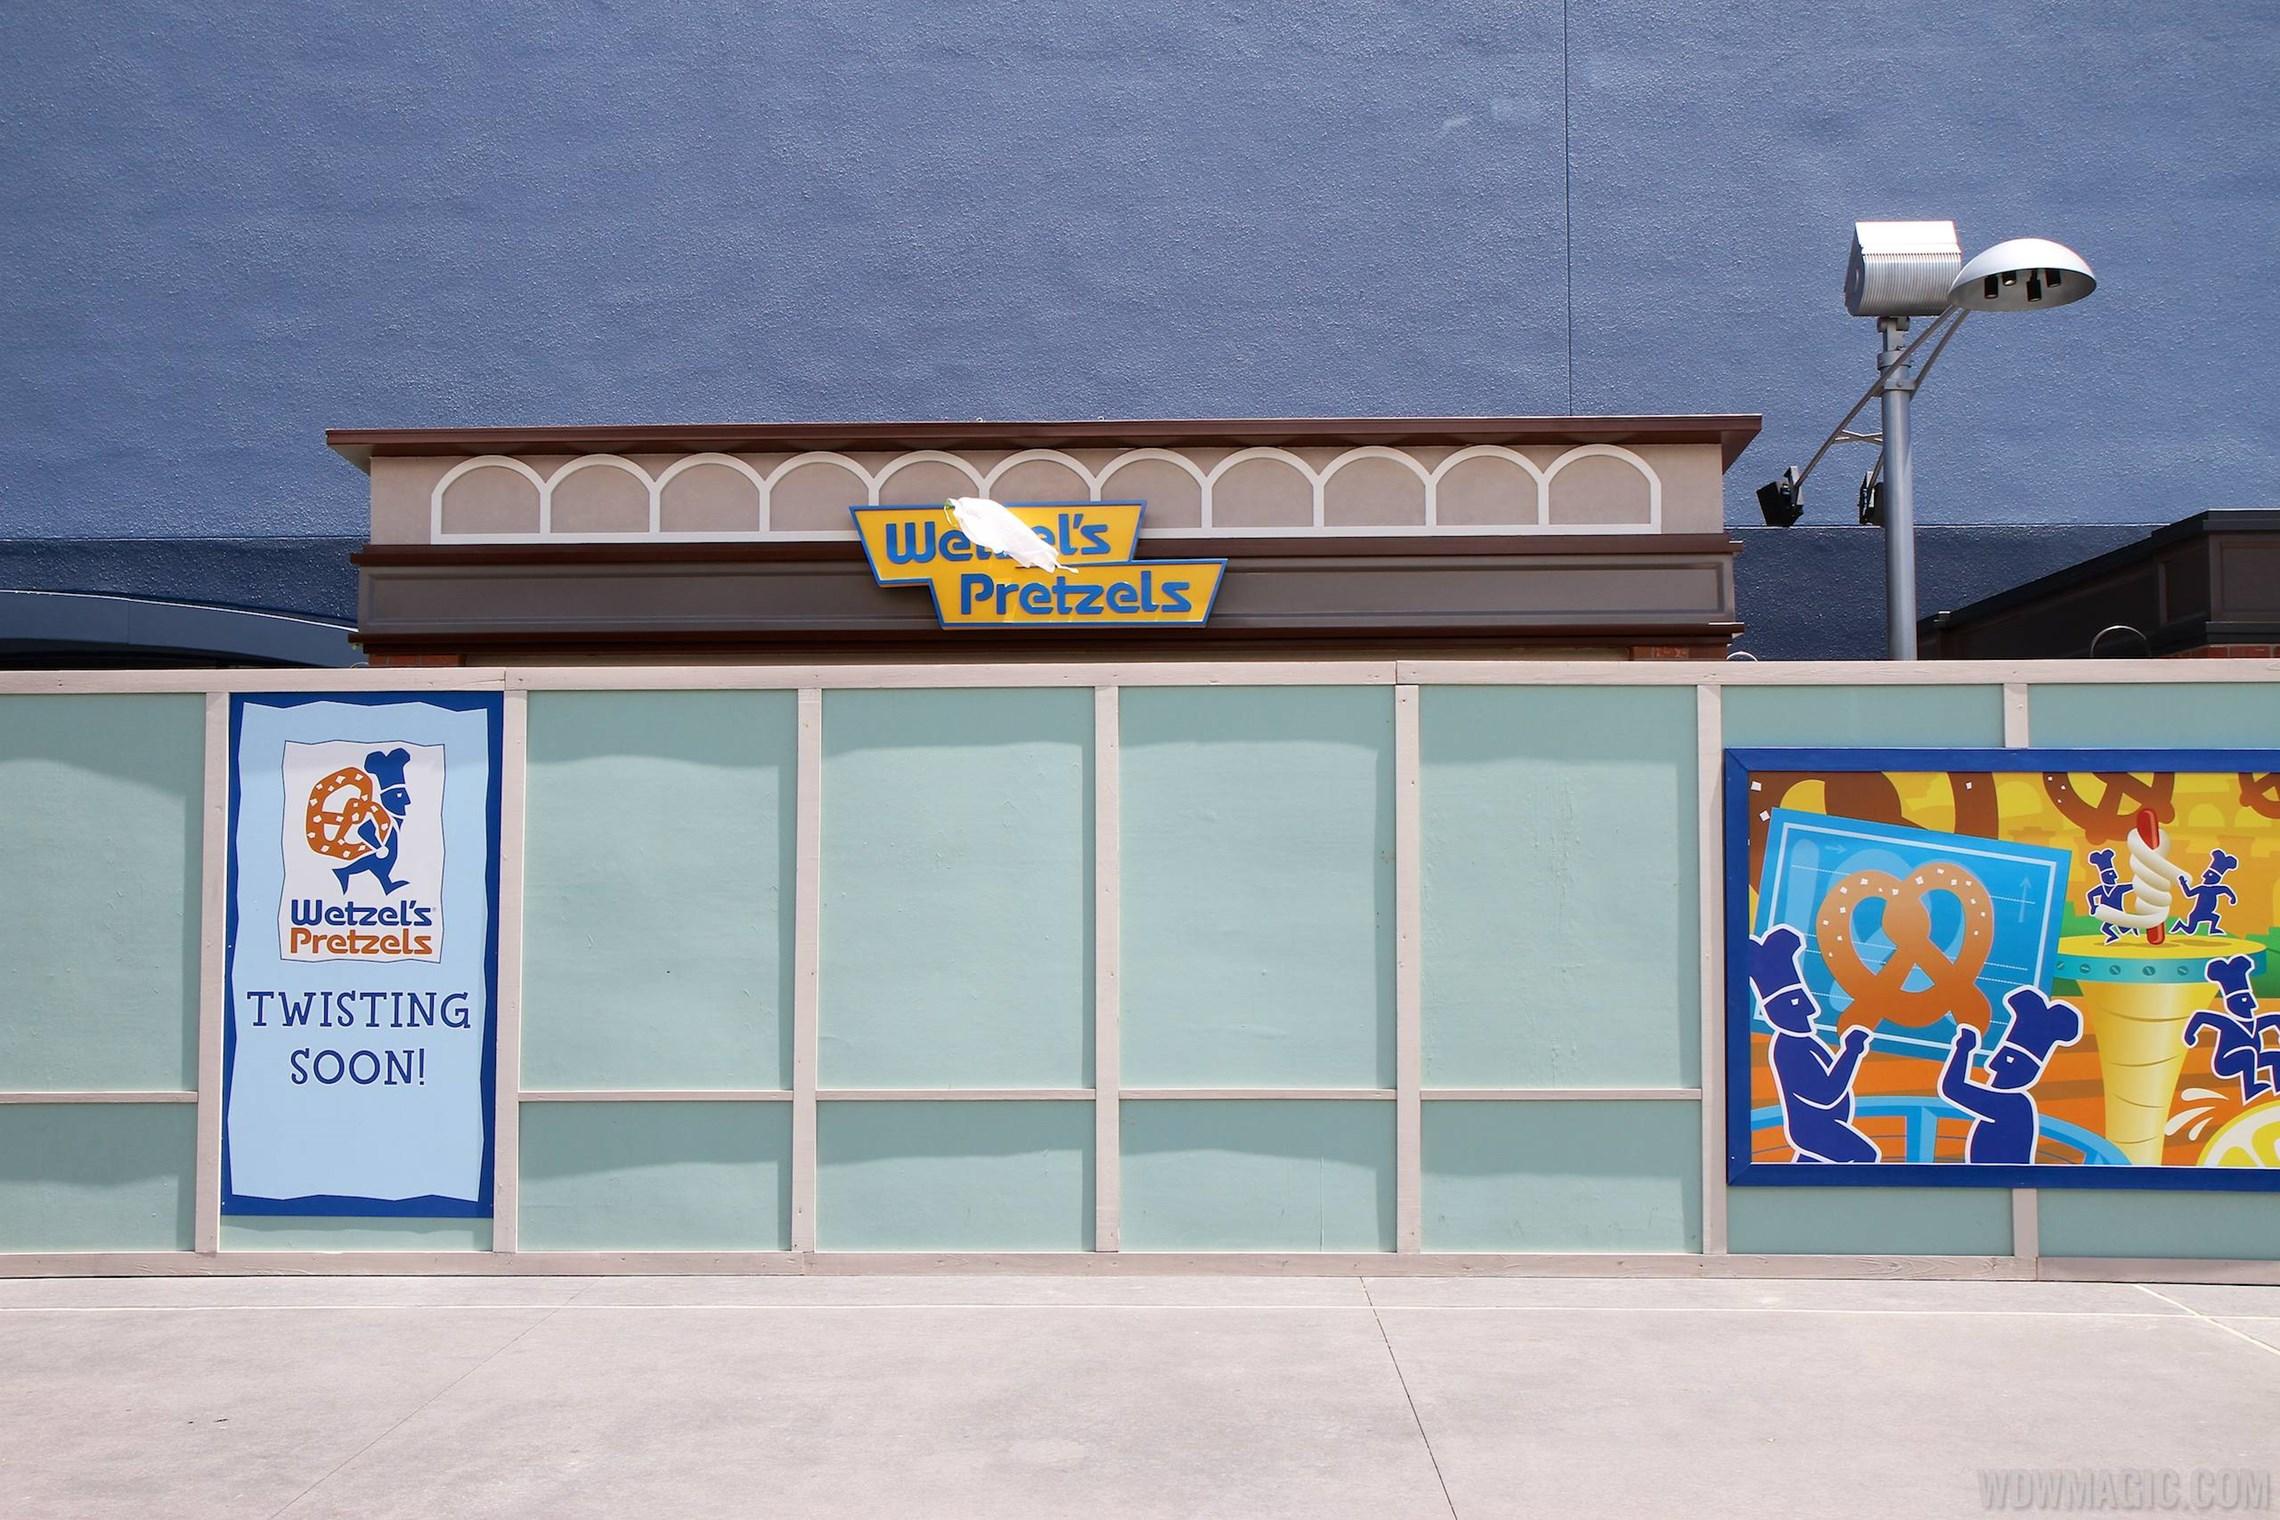 New Wetzel's Pretzels and Haagen Dazs kiosks under construction on the West Side